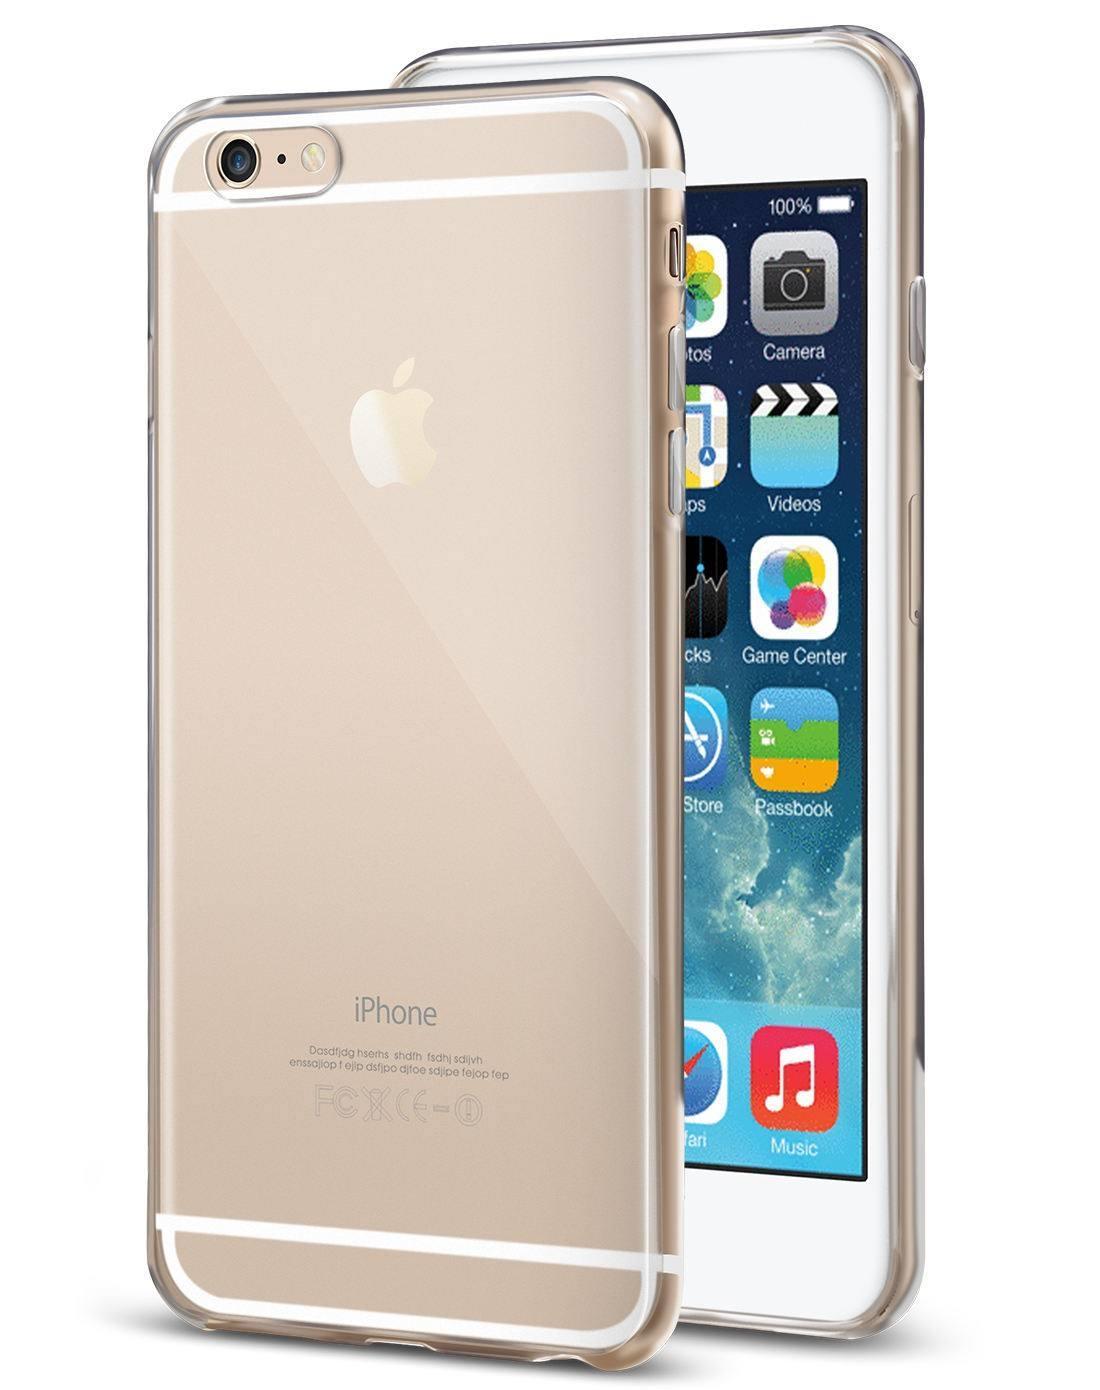 6plus品牌手機模型,道具手機,展示手機,模具模型機 4